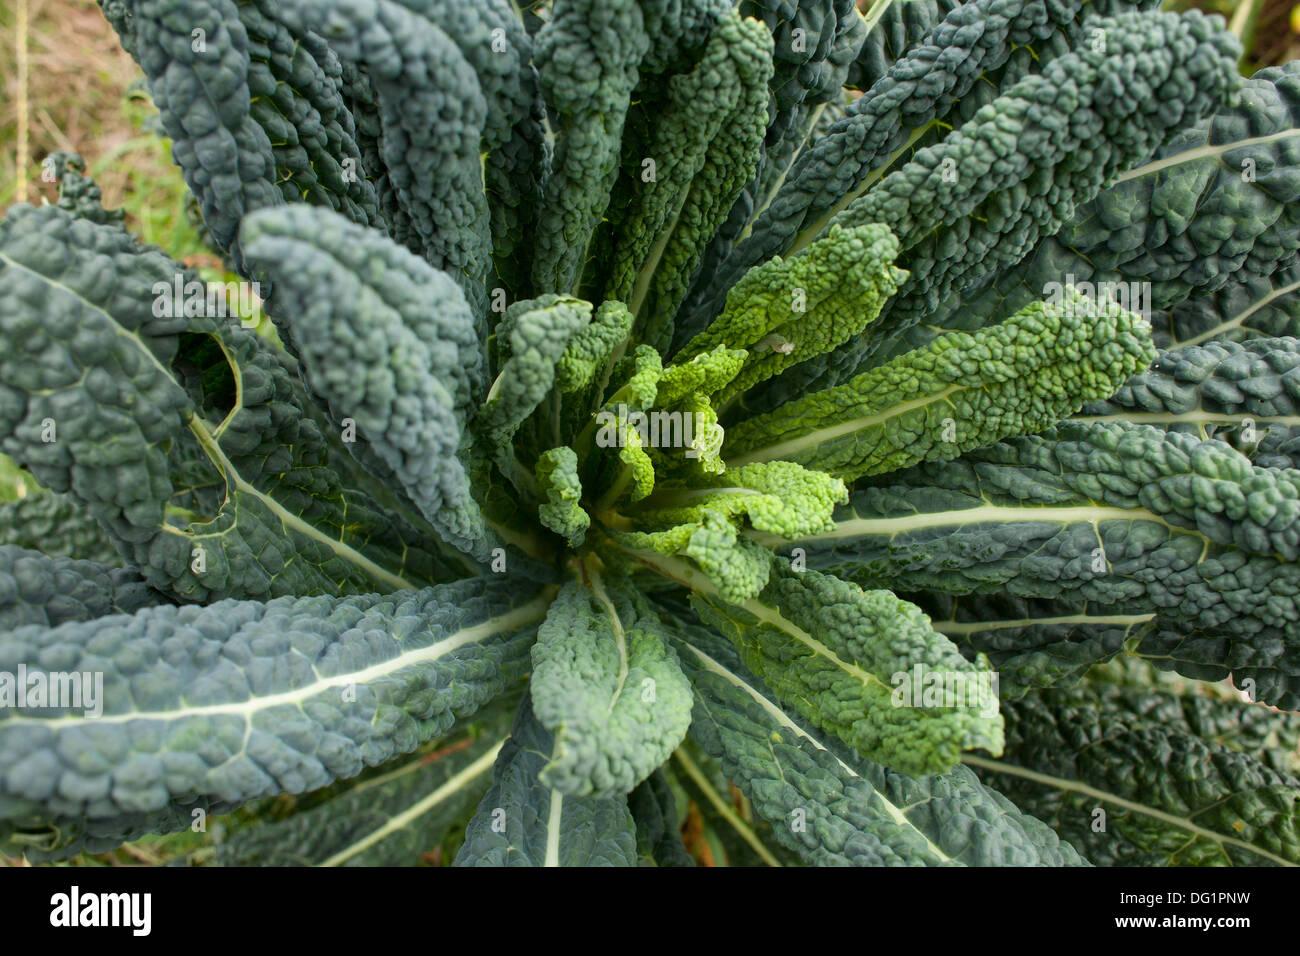 Black kale nutrition